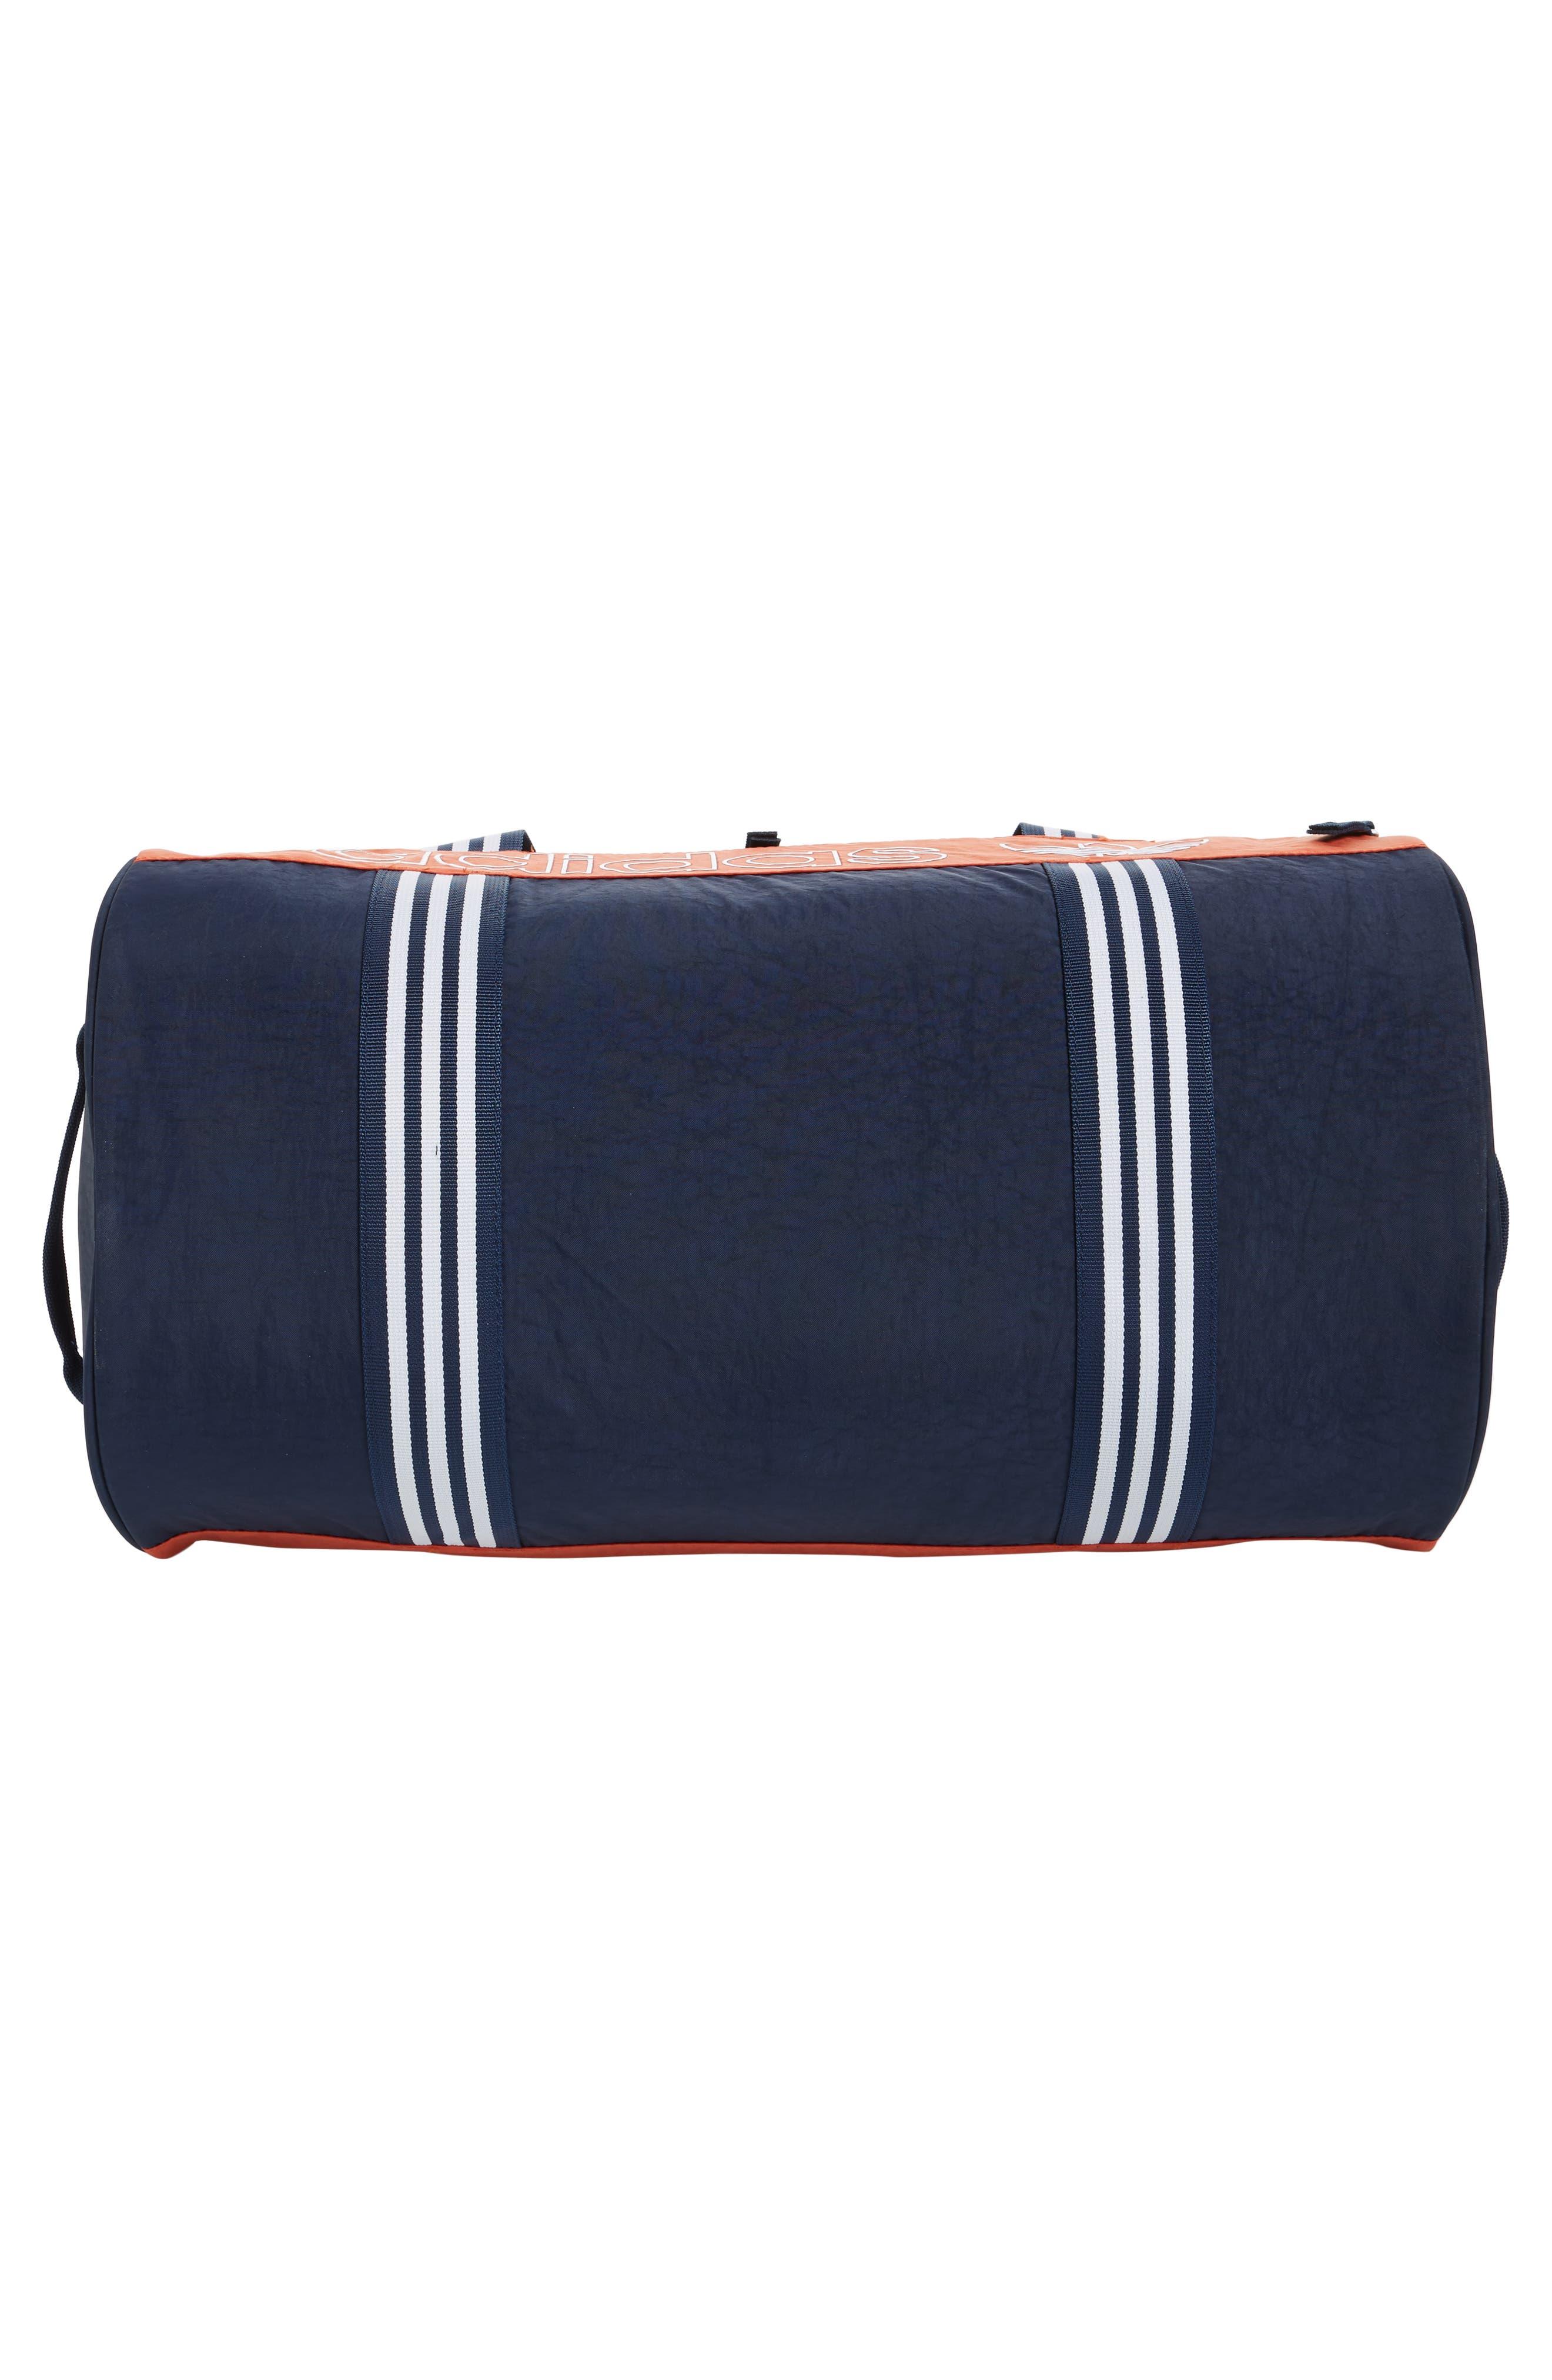 ADIDAS ORIGINALS, adidas Spirit Roll Duffle Bag, Alternate thumbnail 6, color, COLLEGIATE NAVY/ AMBER/ WHITE